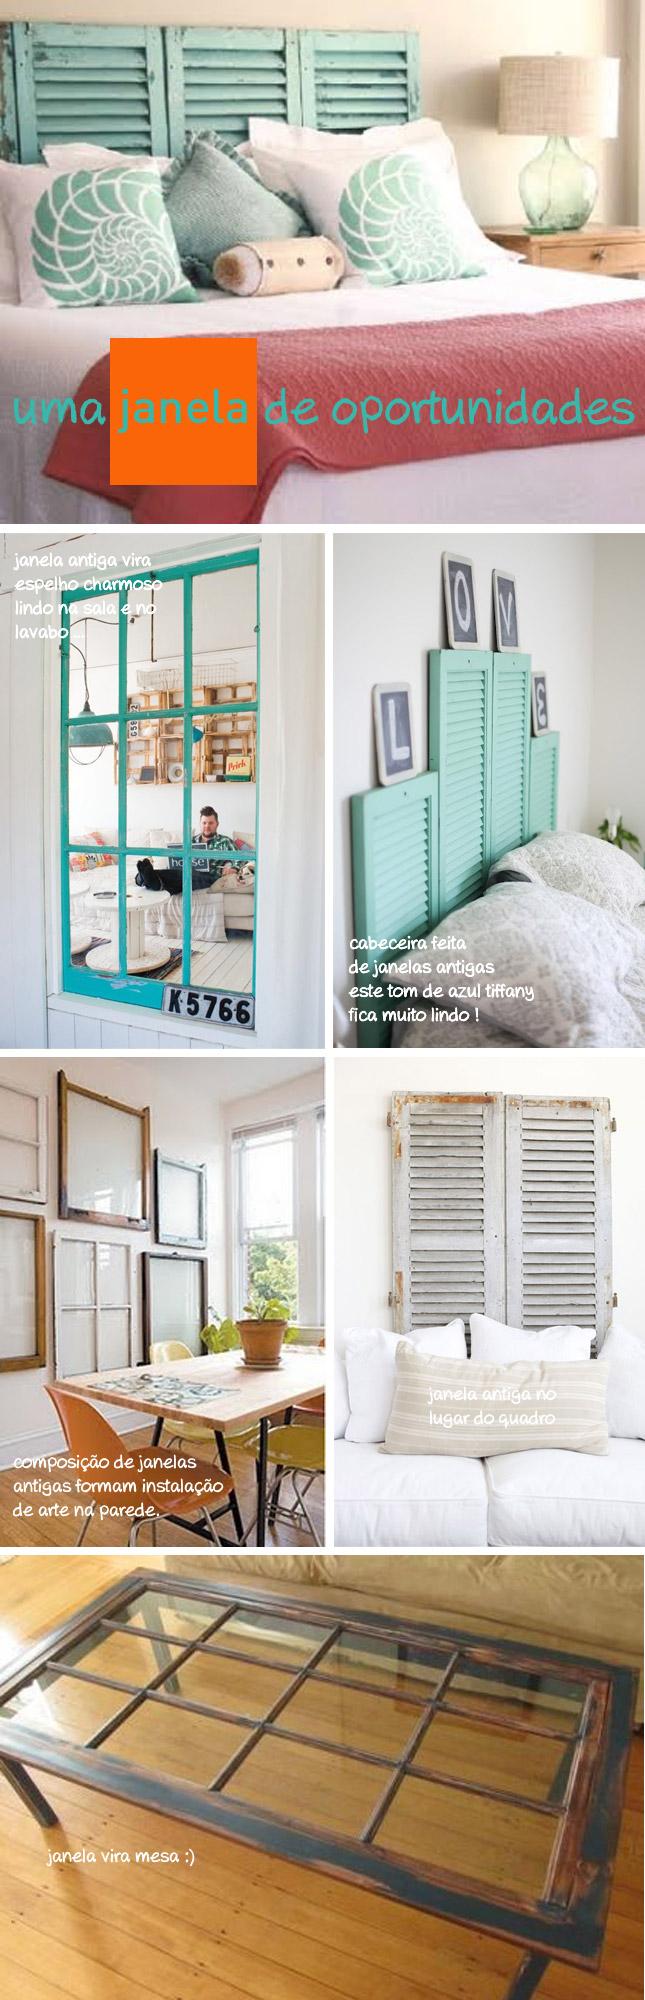 decoradornet-janelas-reinventadas-1